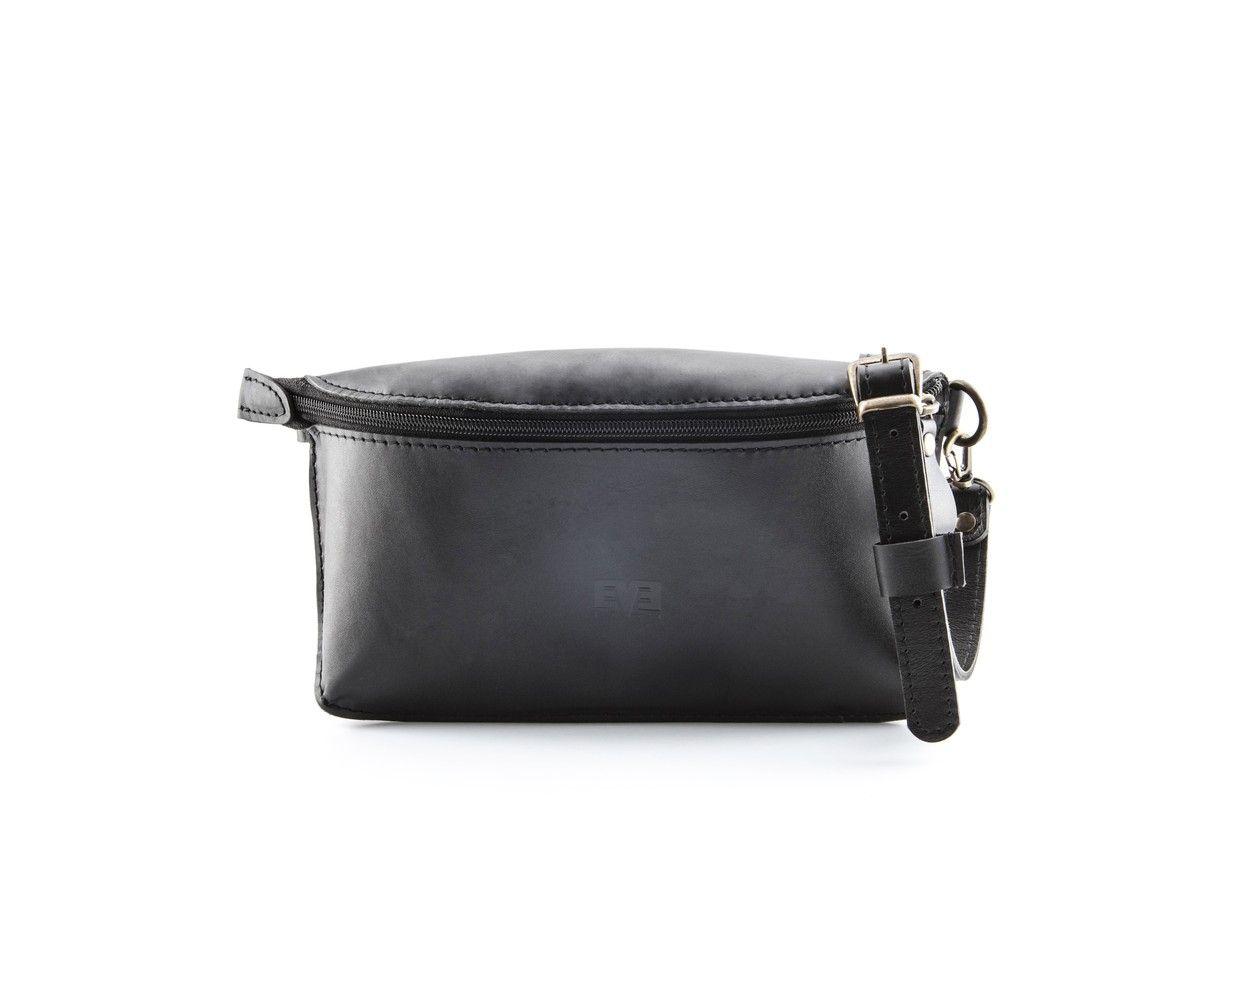 b16af08d9c35 Поясная кожаная сумка Виноград Чёрная | koshel | Pinterest